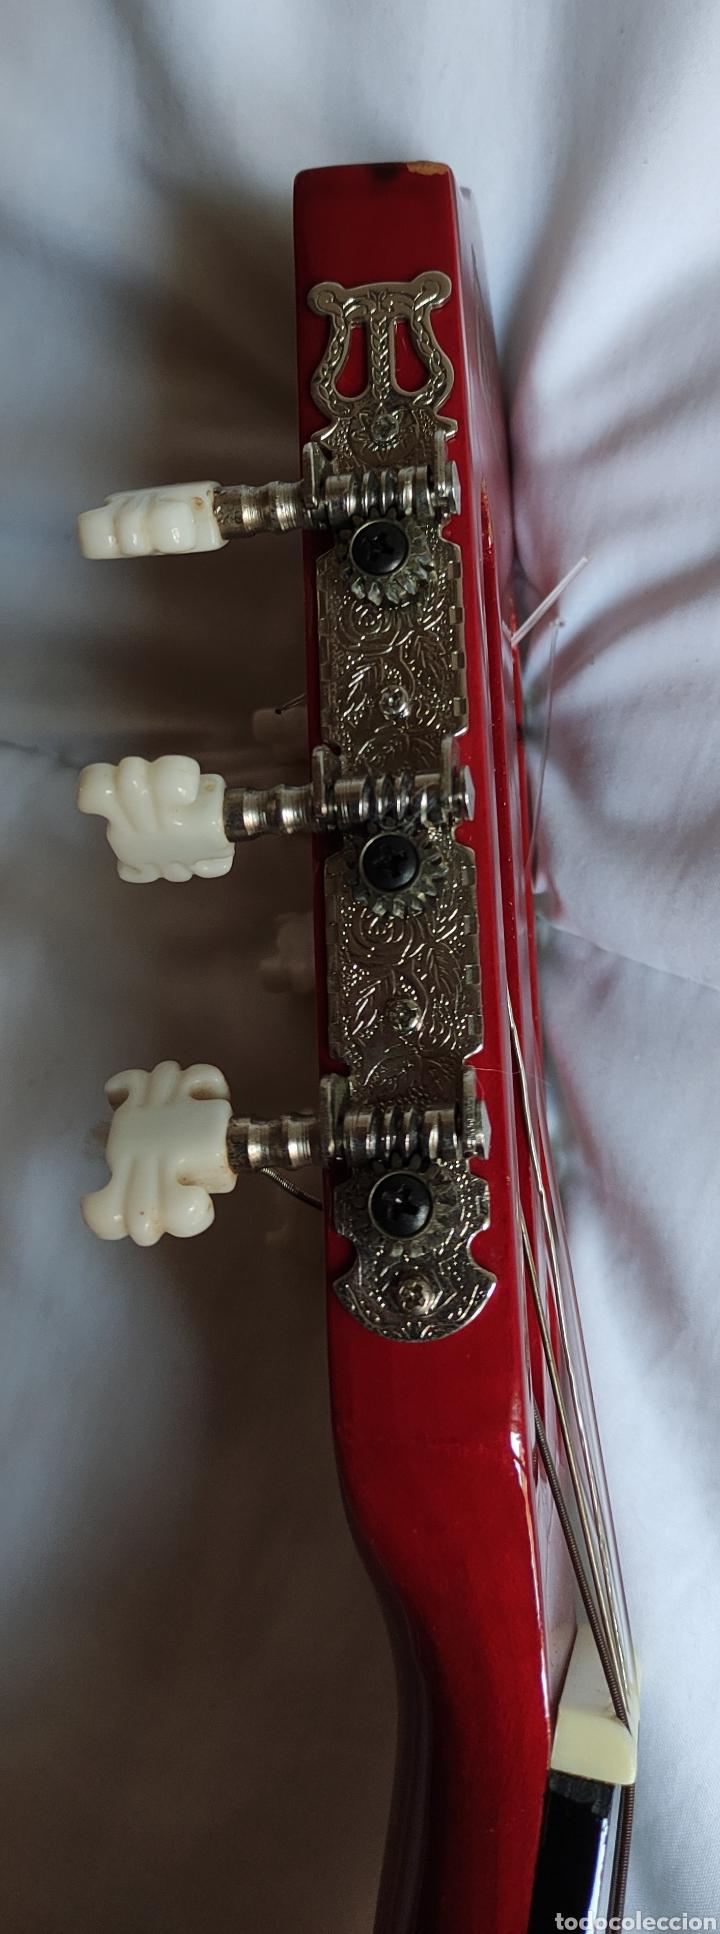 Instrumentos musicales: Guitarra - Foto 12 - 228417015